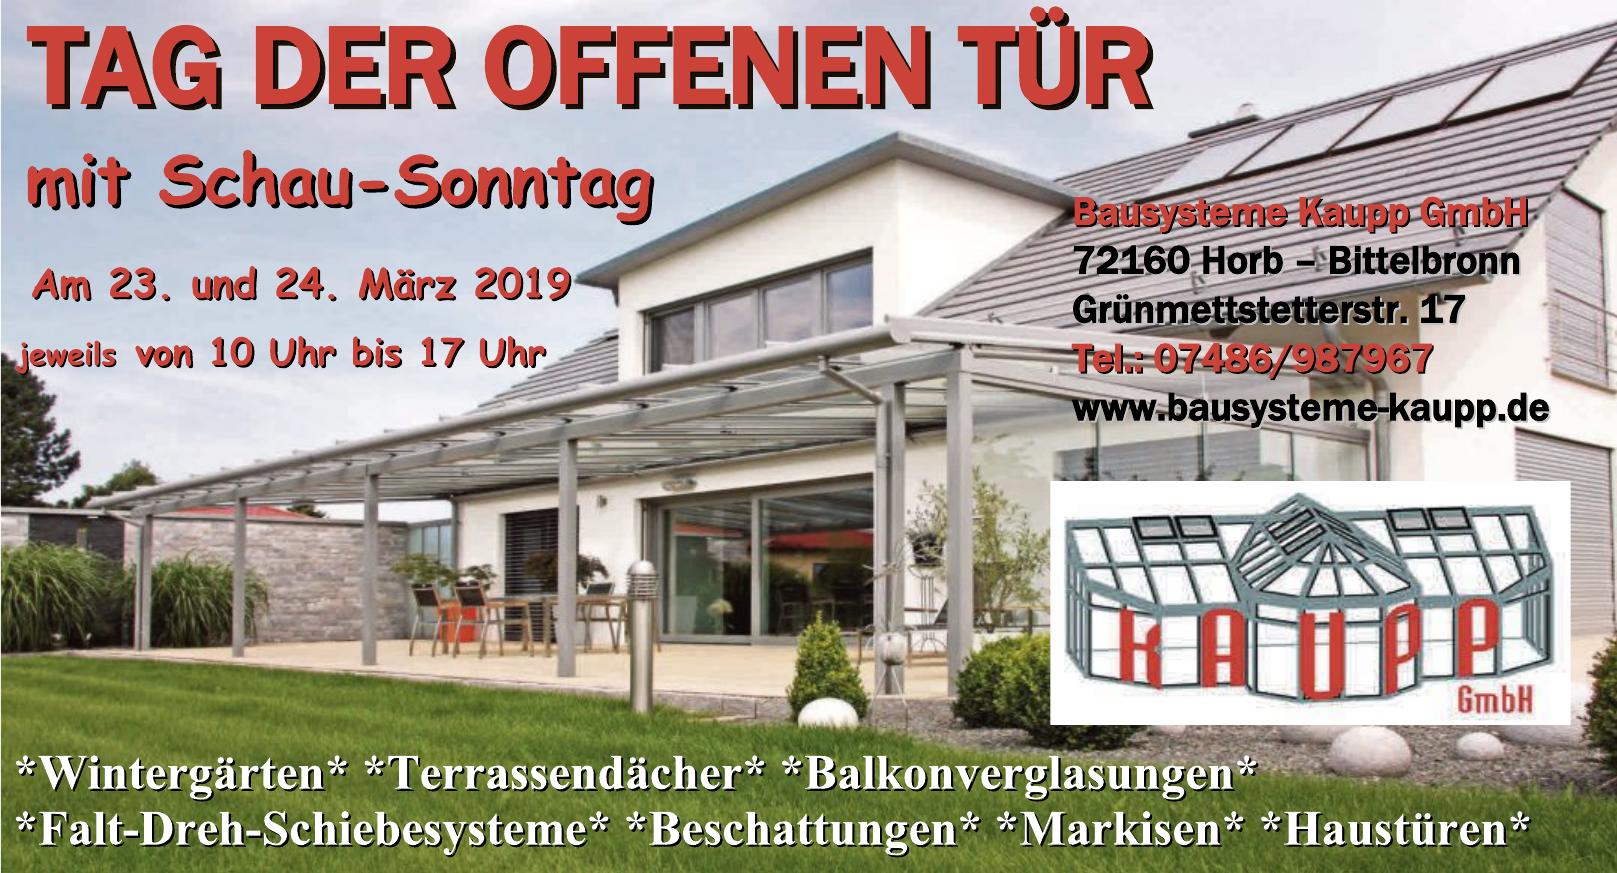 Bausysteme Kaupp GmbH